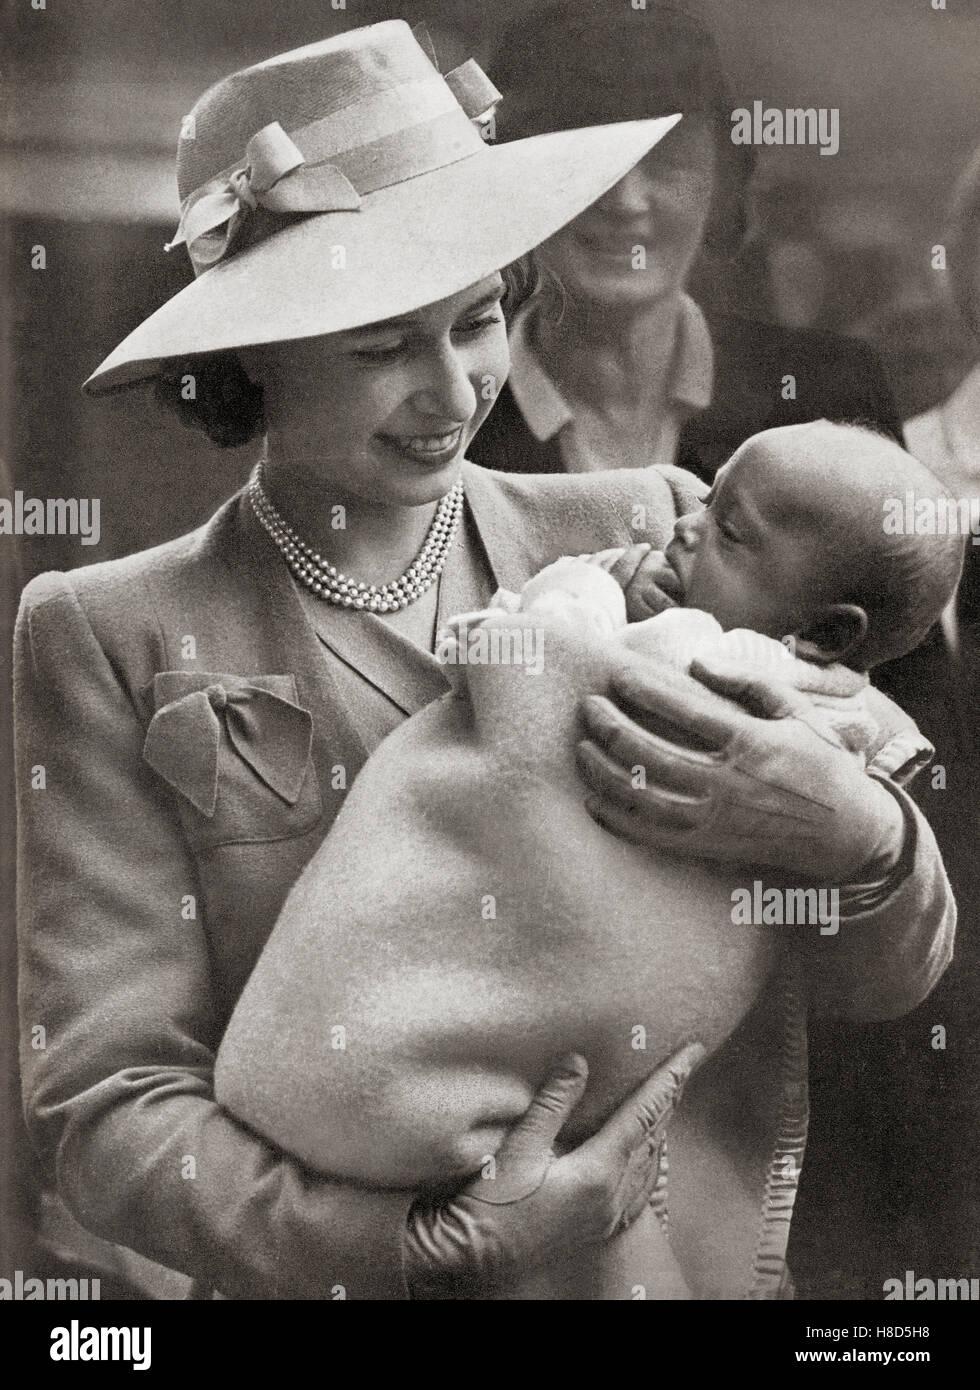 Princess Elizabeth, future Elizabeth II, born 1926.  Queen of the United Kingdom, Canada, Australia and New Zealand. - Stock Image